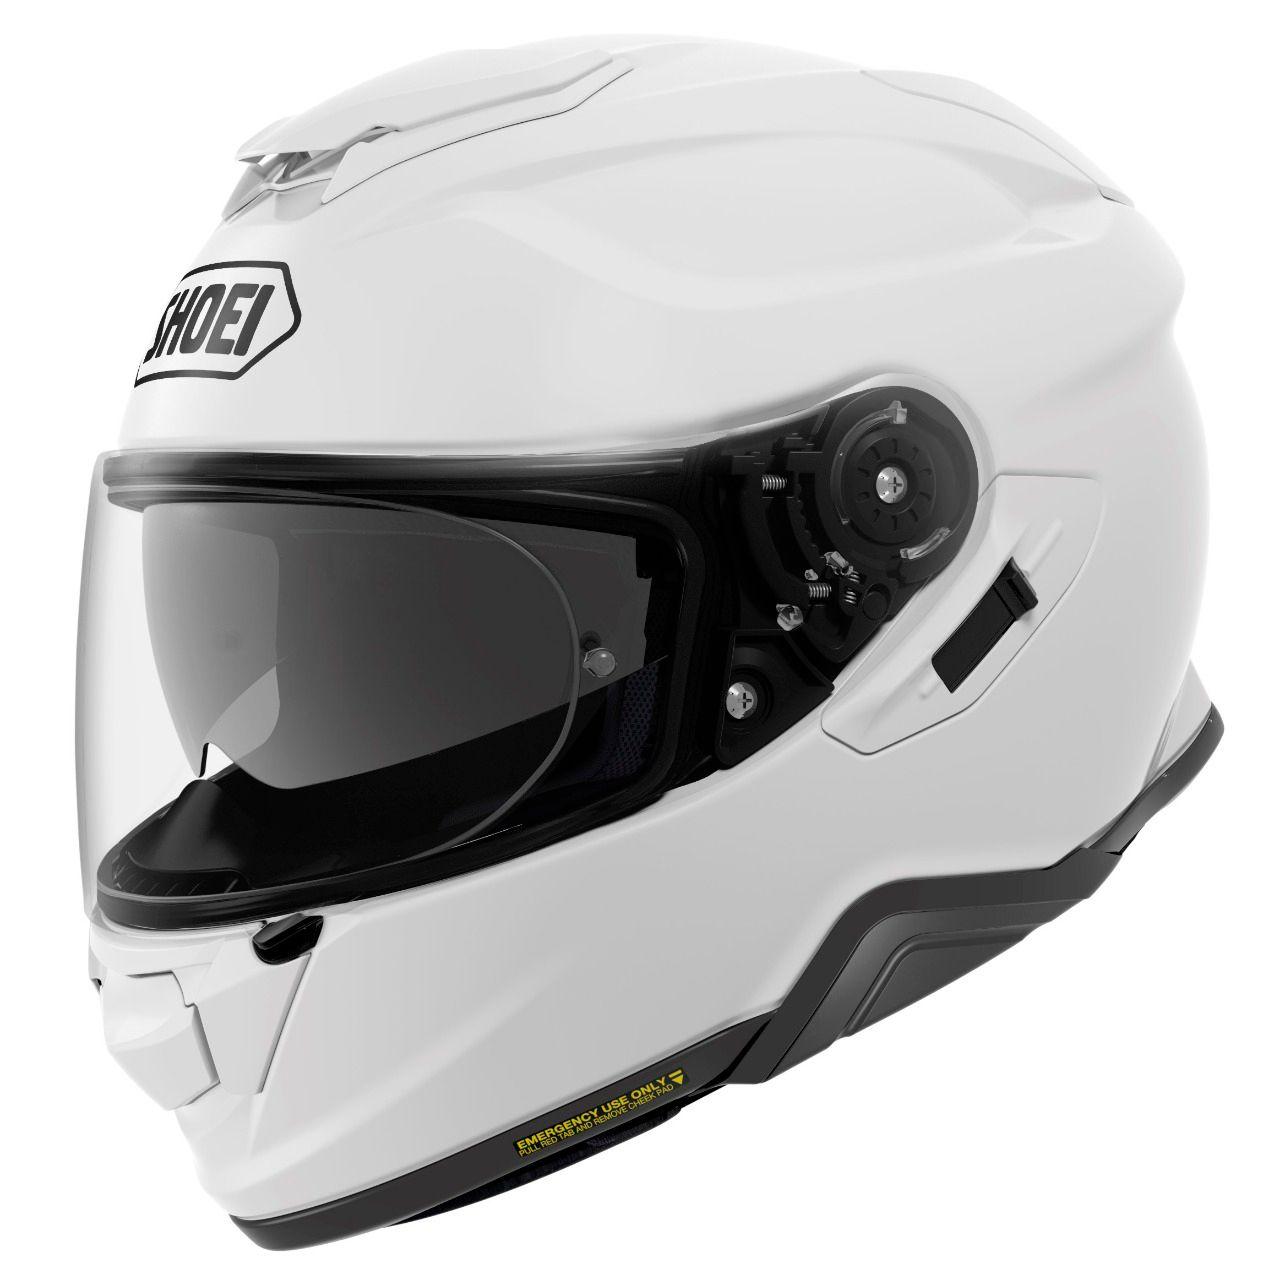 Capacete Shoei GT-Air II White C/ Viseira Solar - Lançamento 2019  - Planet Bike Shop Moto Acessórios